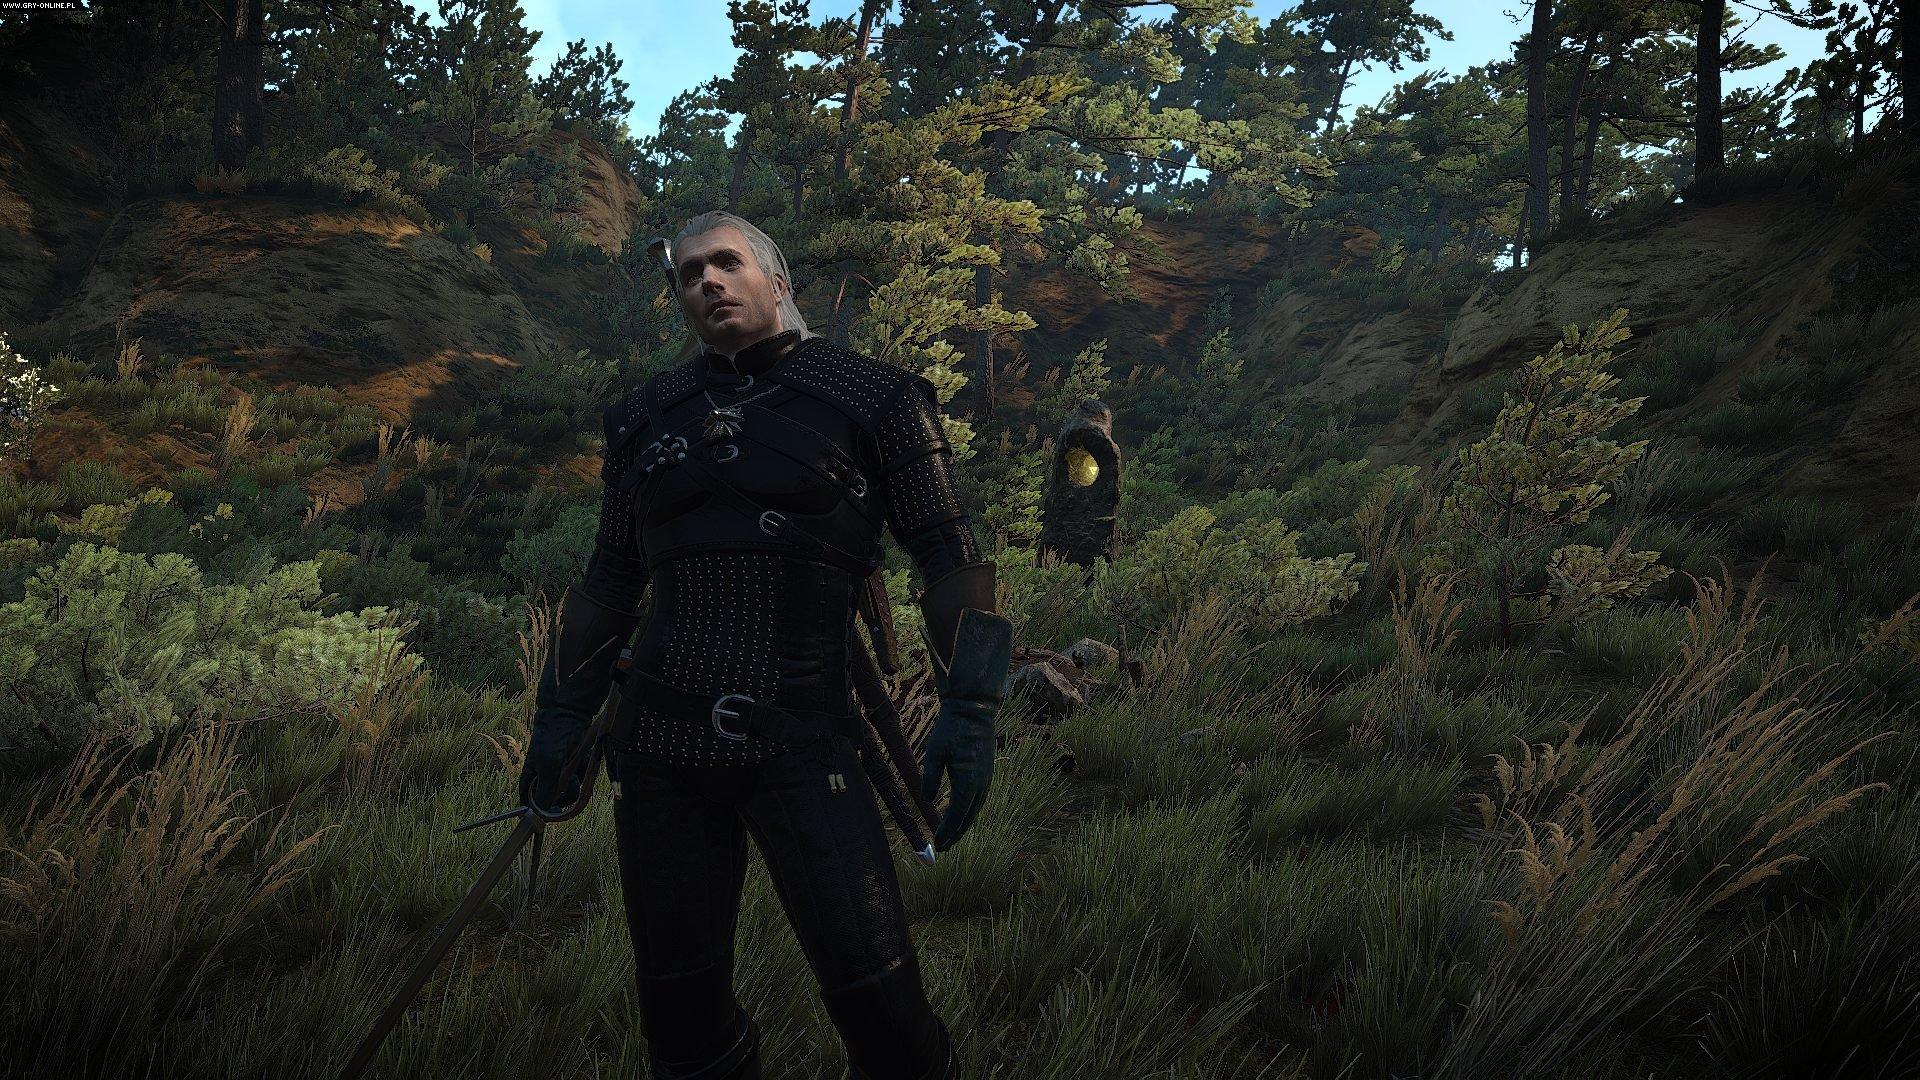 Netflix Mods Henry Cavill Vs Wild Hunt Best Mods For Witcher 3 Wild Hunt Gamepressure Com